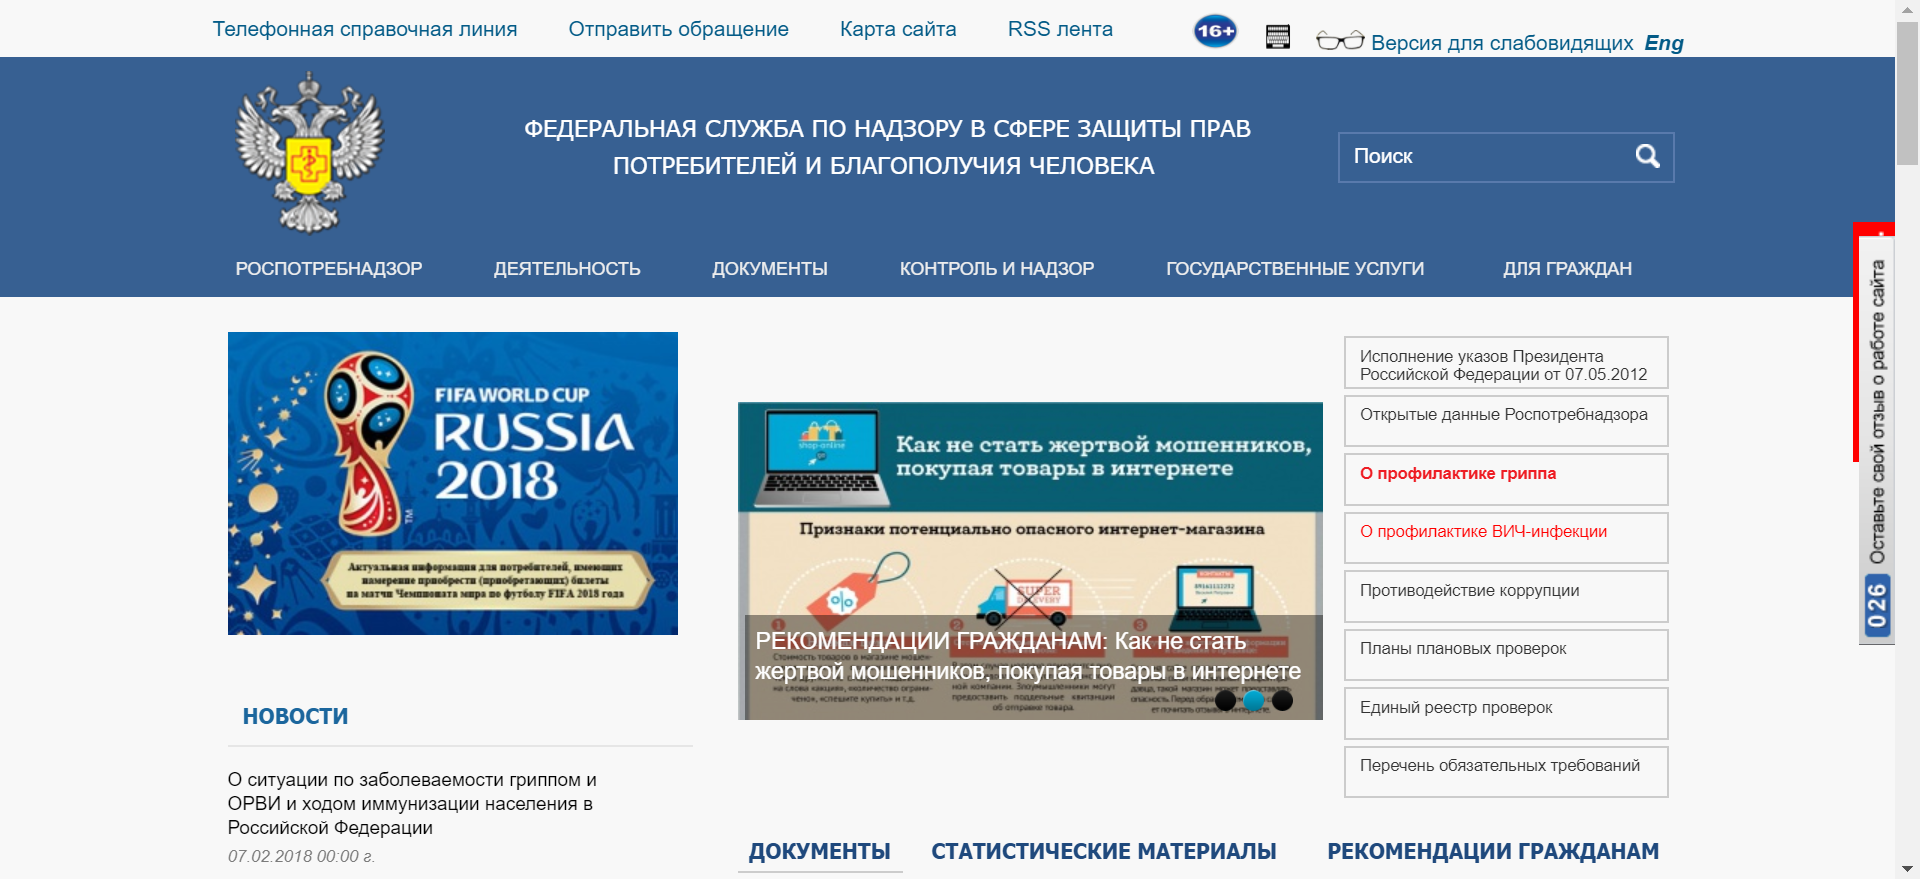 сайт Роспотребнадзора